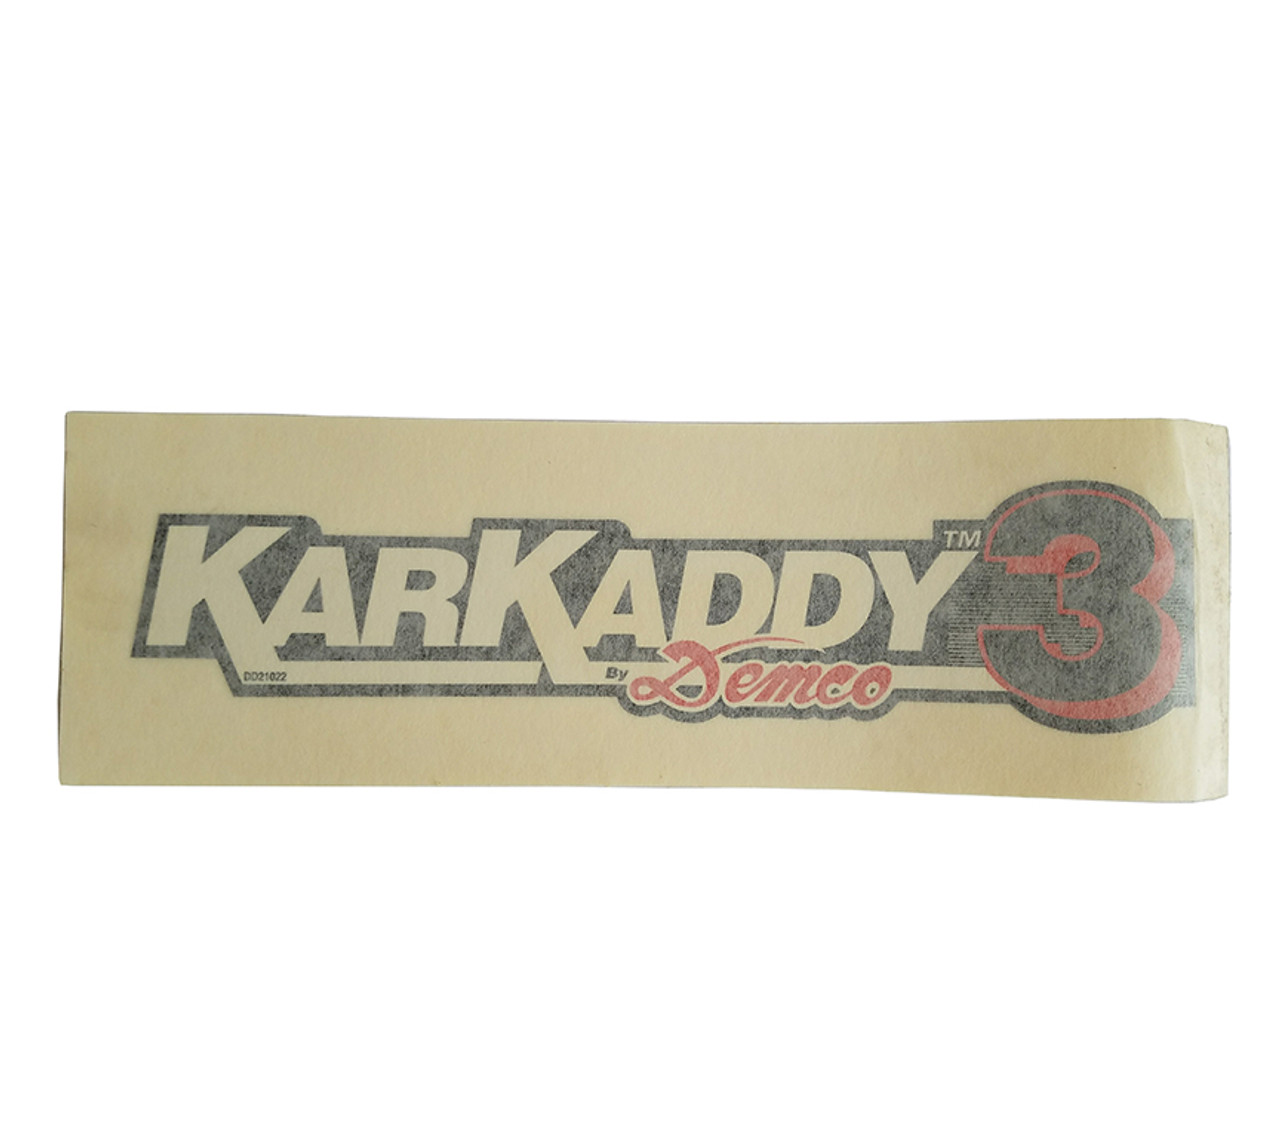 DD21022 --- Demco KarKaddy3 Decal